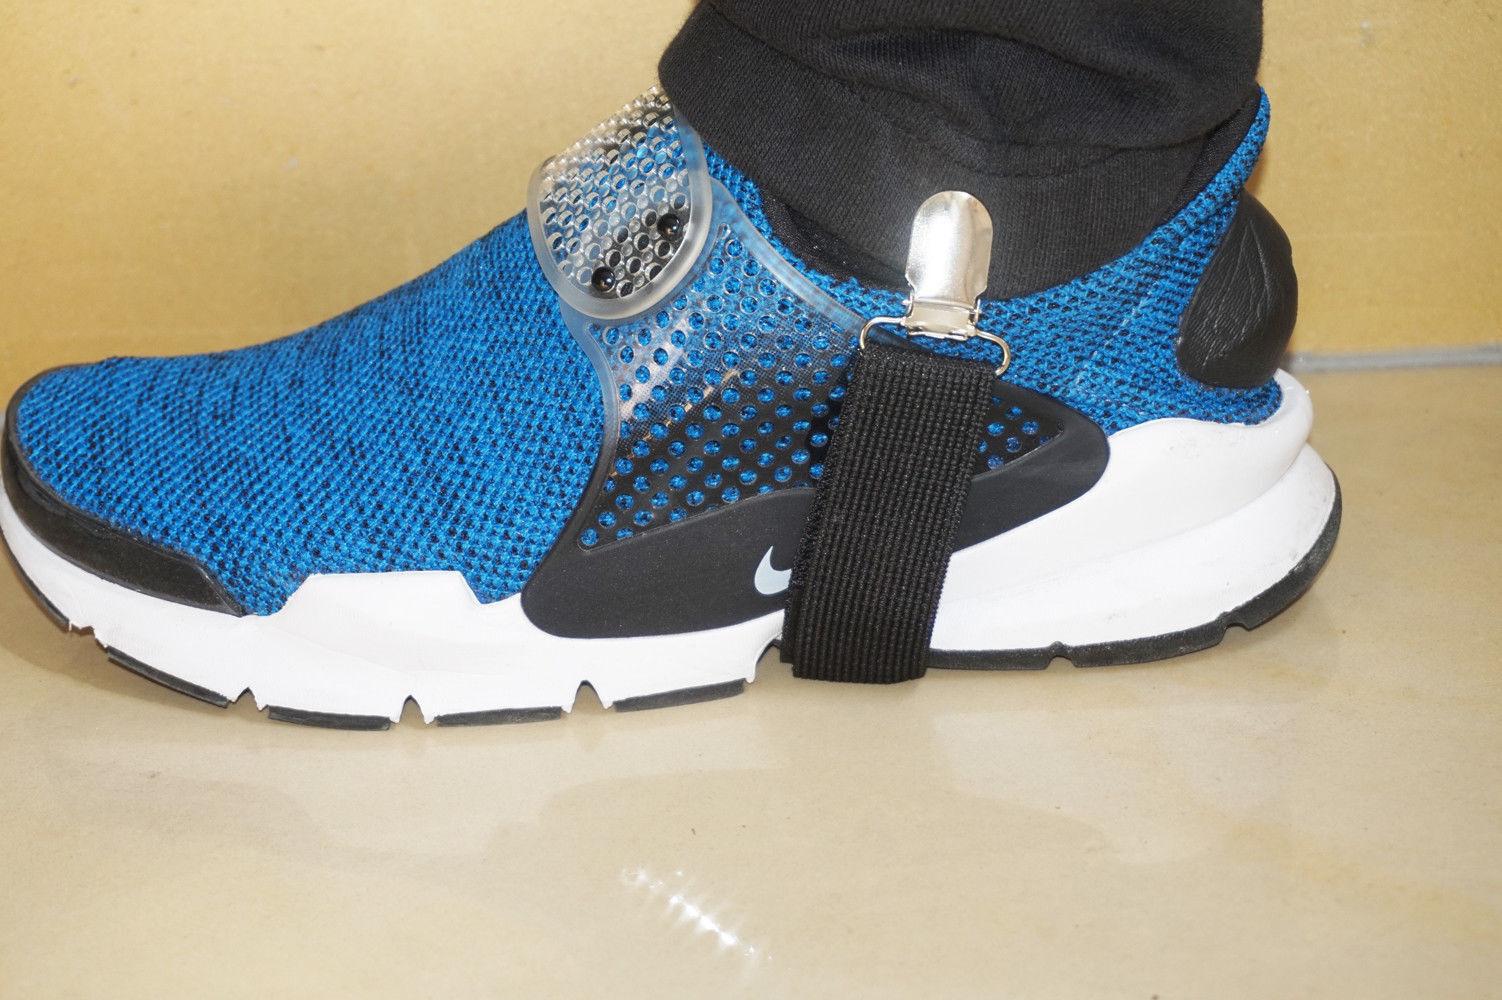 2x Men Women Boots Chains Fashion Western Shoe Elastic Strap High Stockings Clip